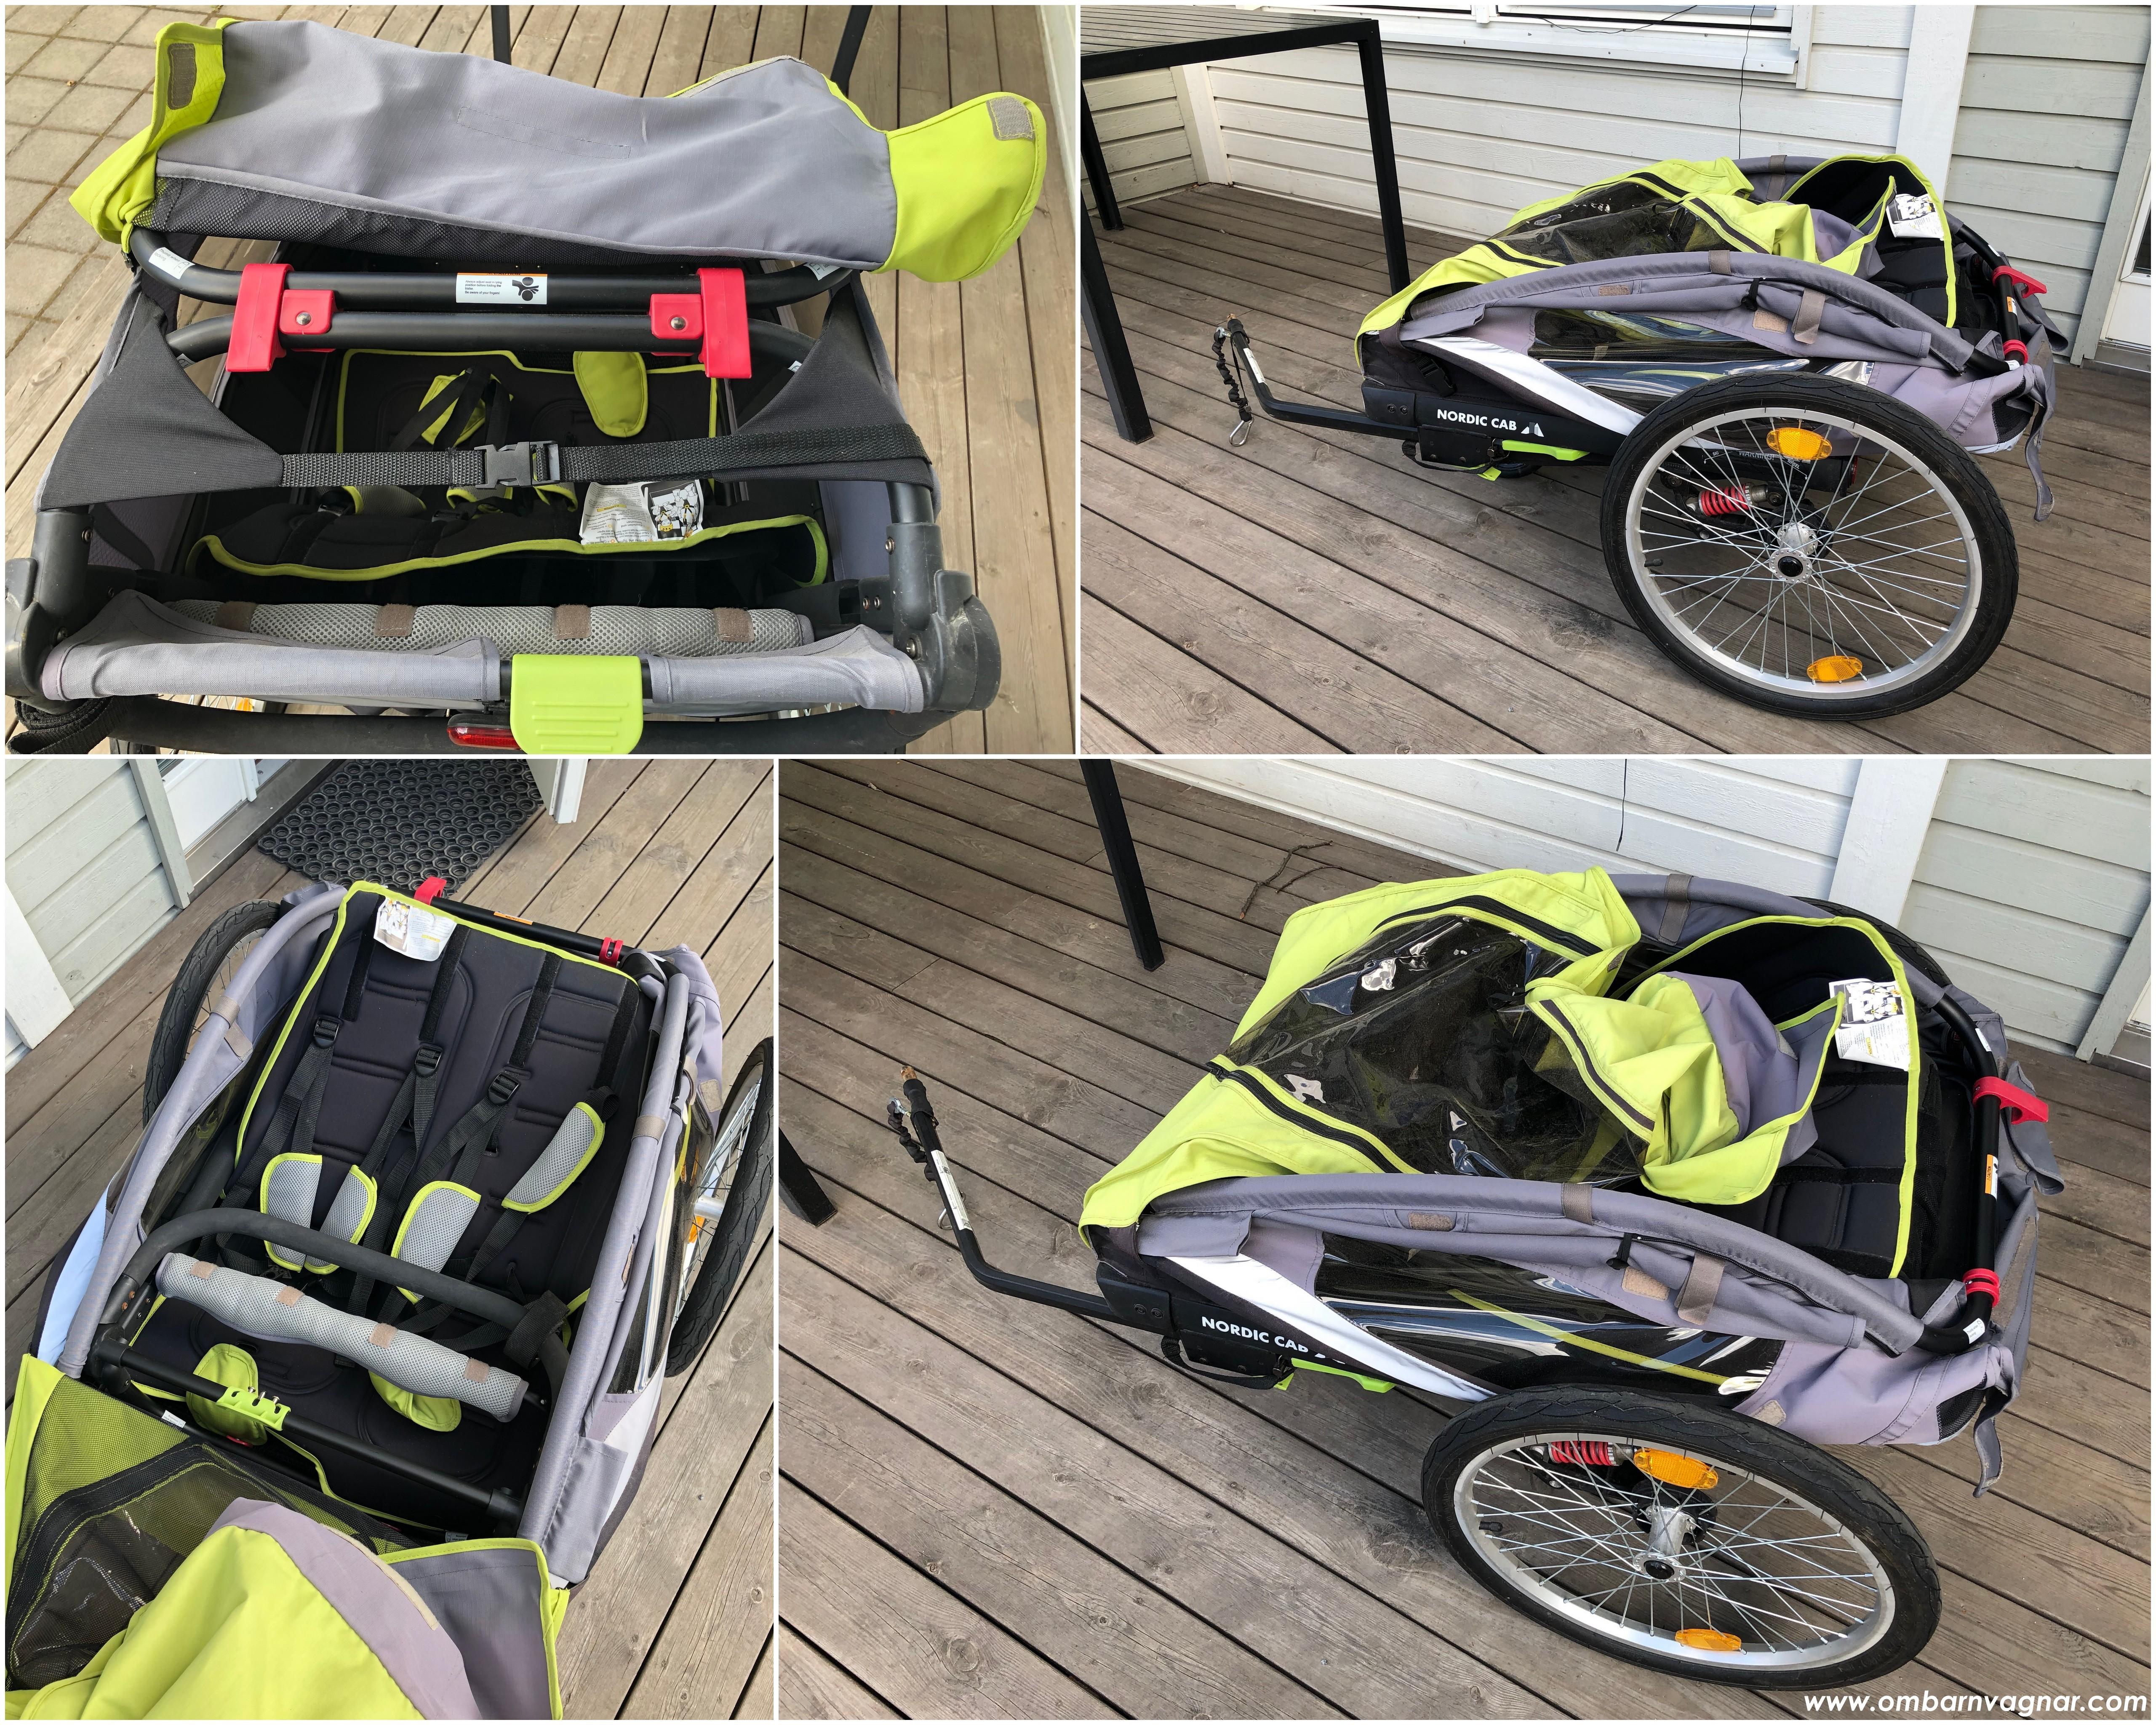 Nordic Cab Active 2-in-1 Cykelvagn ihopfällning fälla ihop cykelvagnen